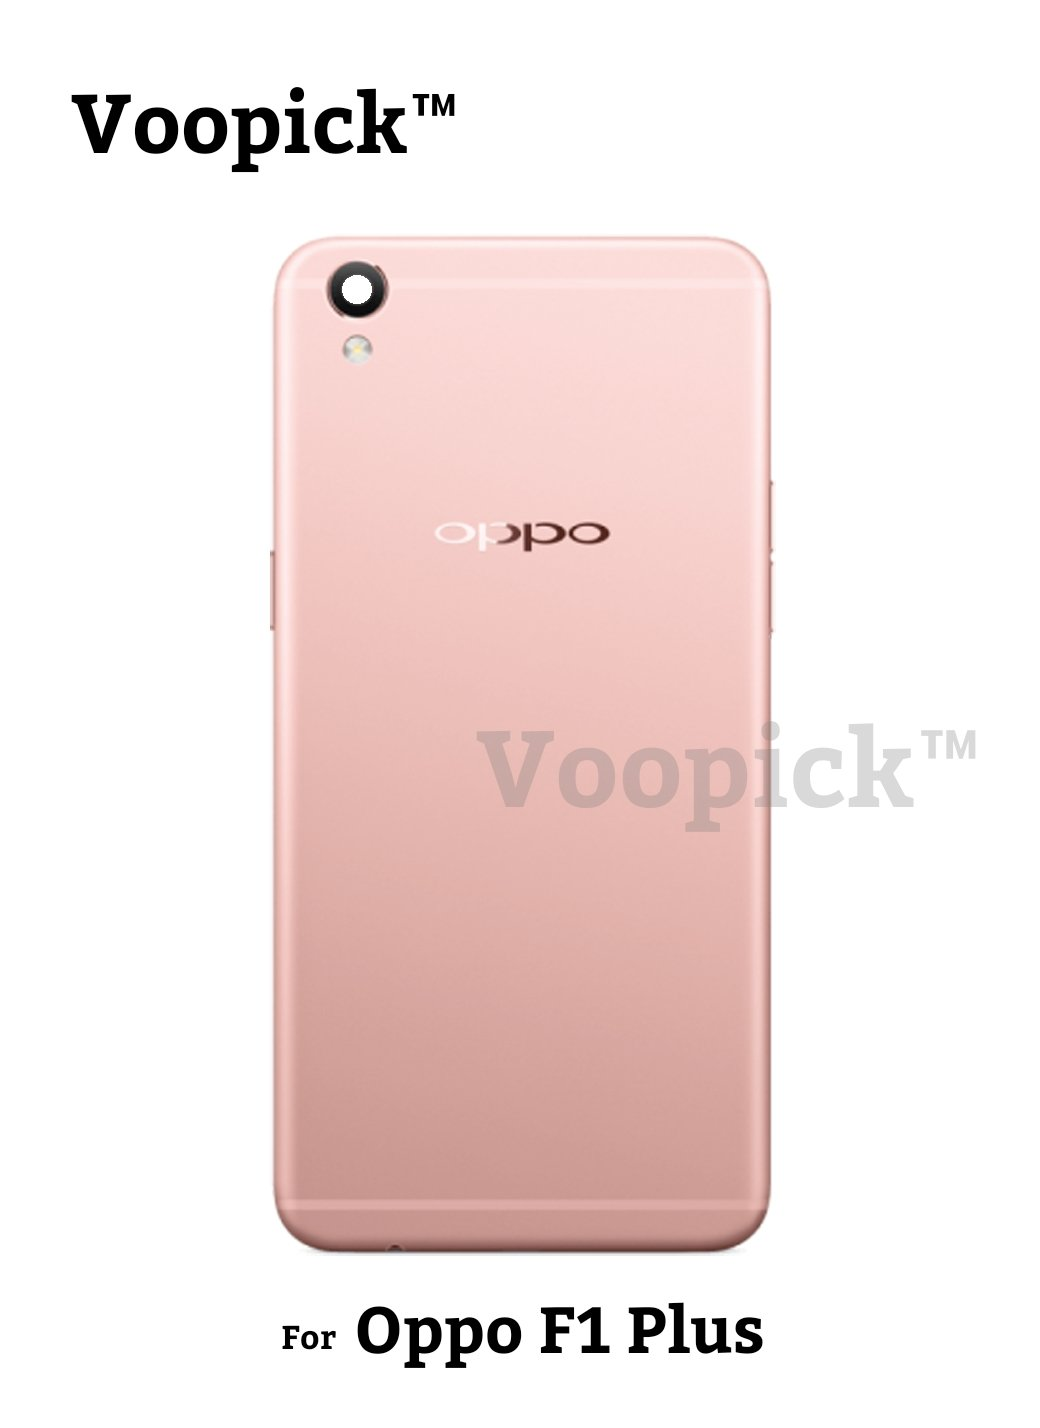 Voopick Oppo F1 Plus Battery Door Back Panel Electronics